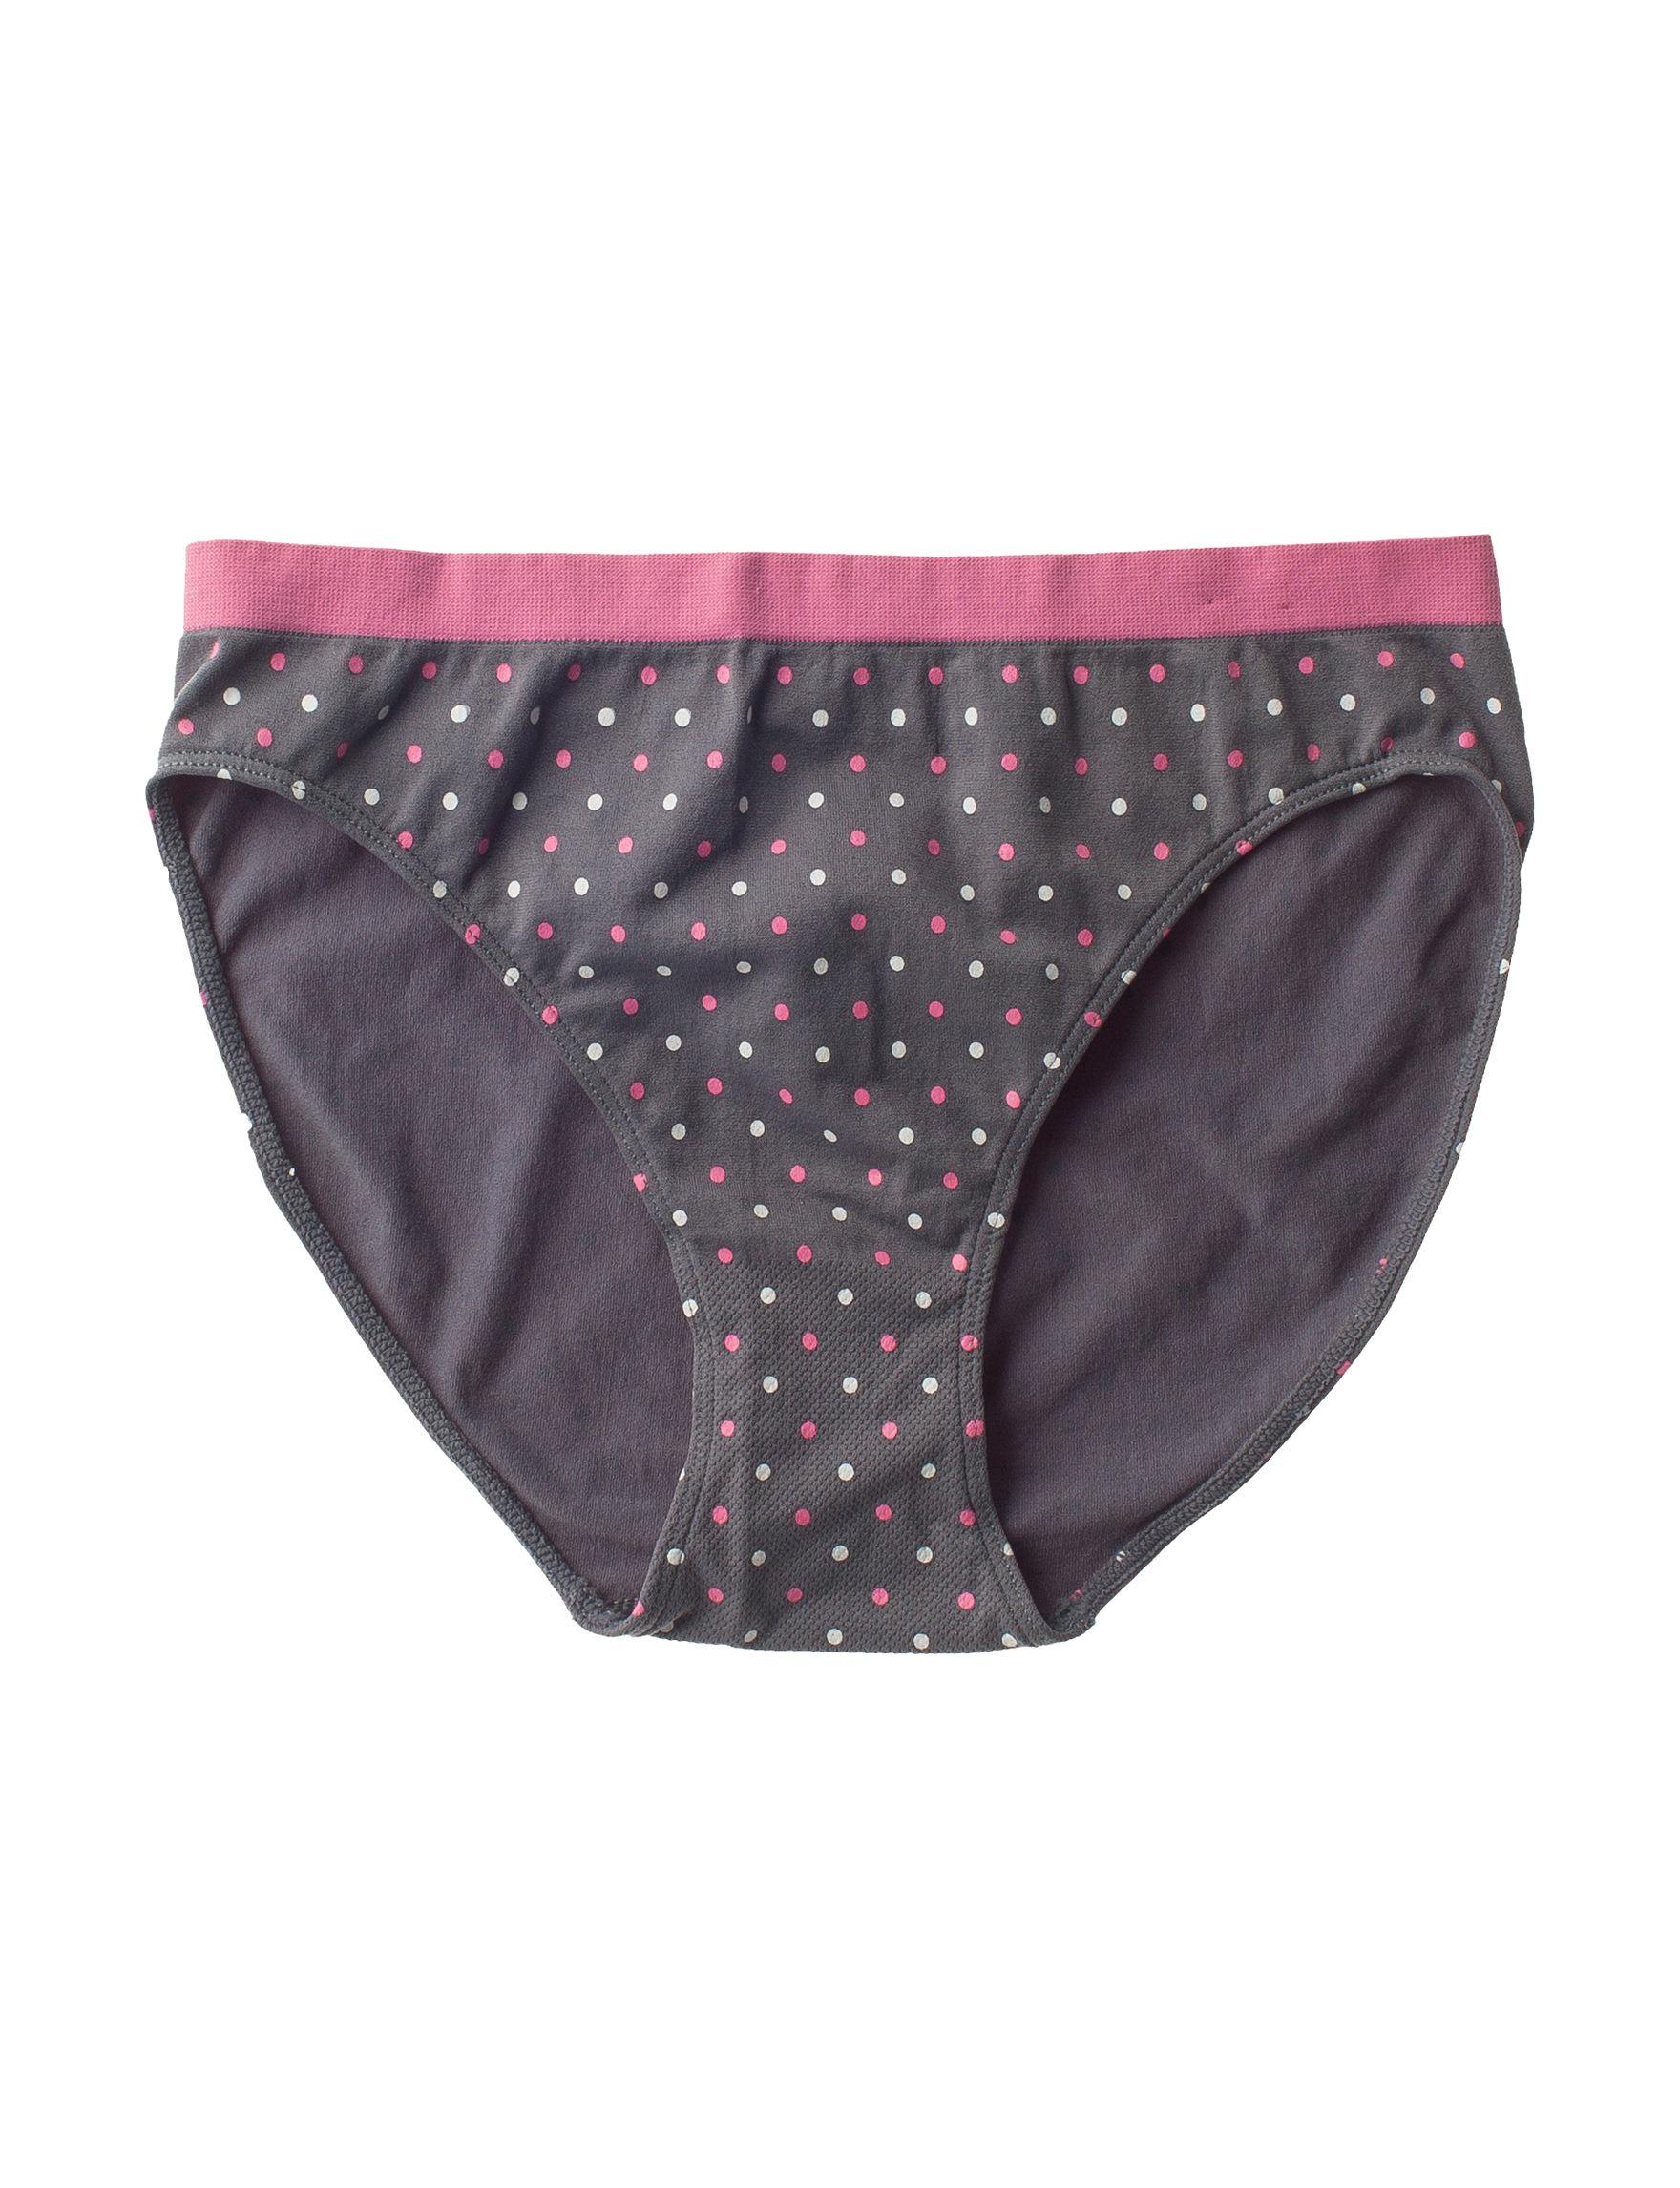 Rene Rofe Grey Multi Panties Full Coverage High Cut